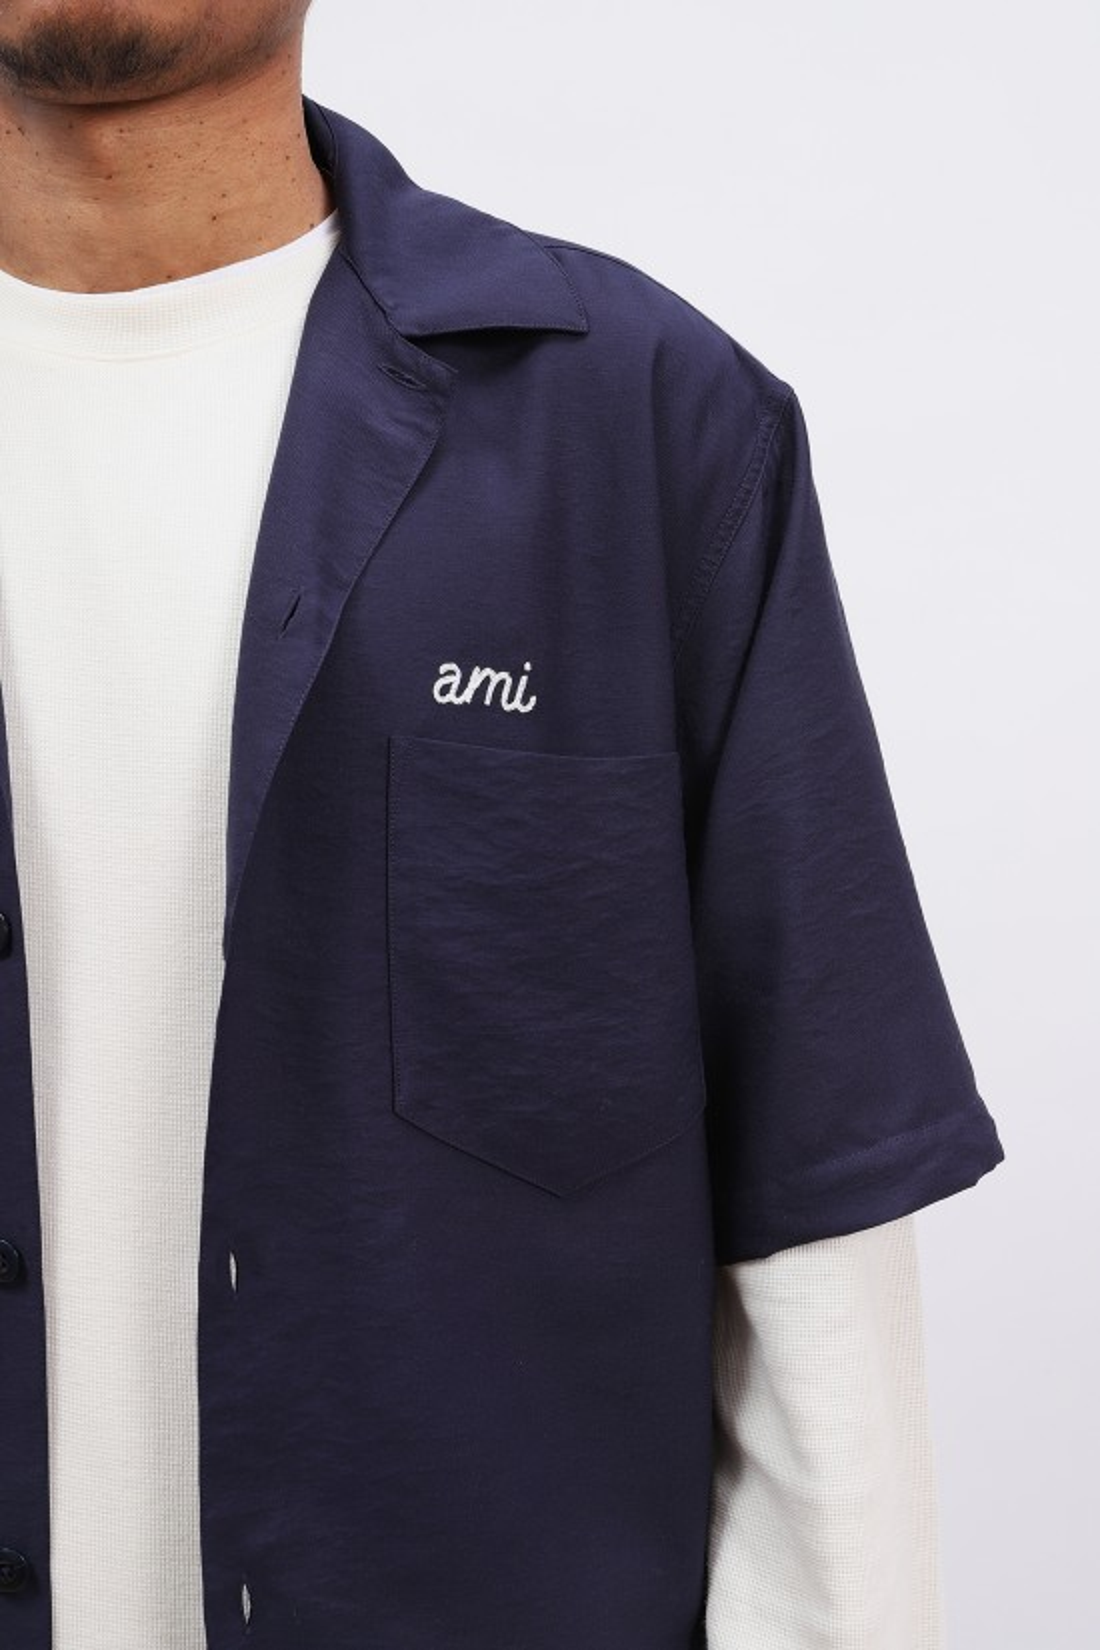 AMI / Chemise broderie ami Marine